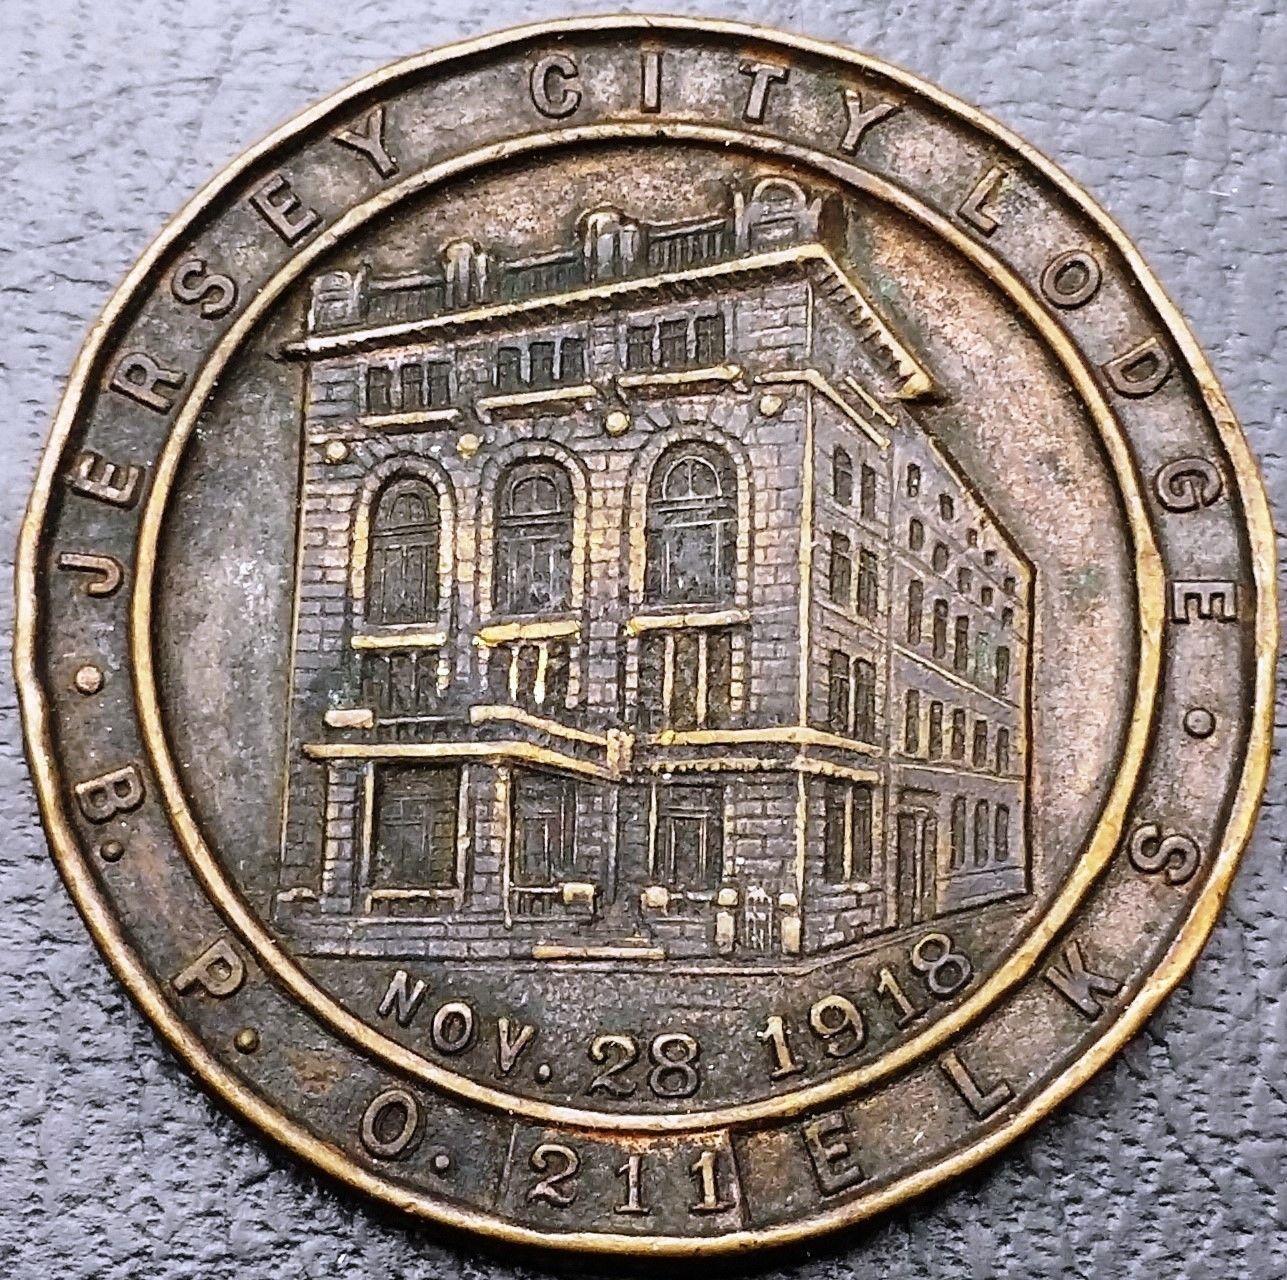 1918 BPOE Elks Lodge Jersey City Fraternal Order Medal - Alfred Schickerling NYC